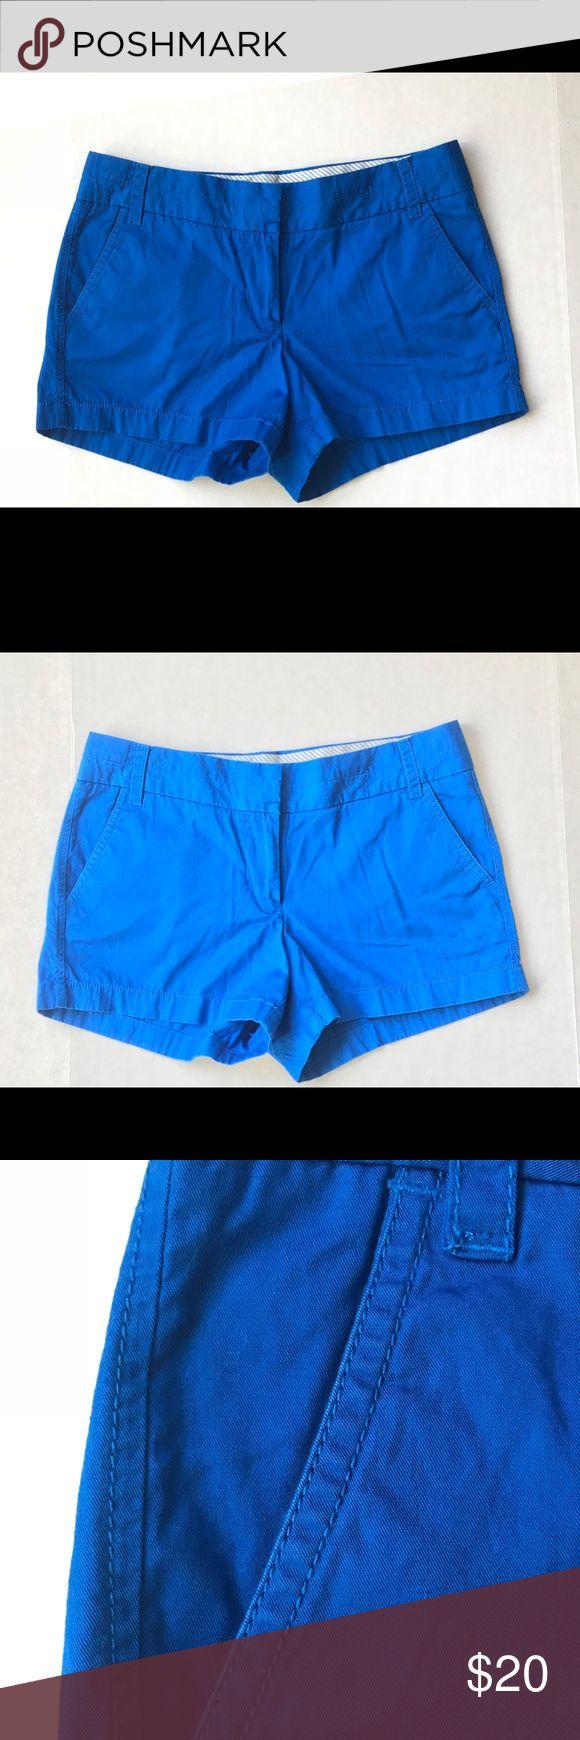 "J. Crew Chino broken in shorts J. Crew brand , broken in chino shorts, cobalt blue EUC , size 8 , 3"" inseam , waist to hem line 11"" J. Crew Shorts"